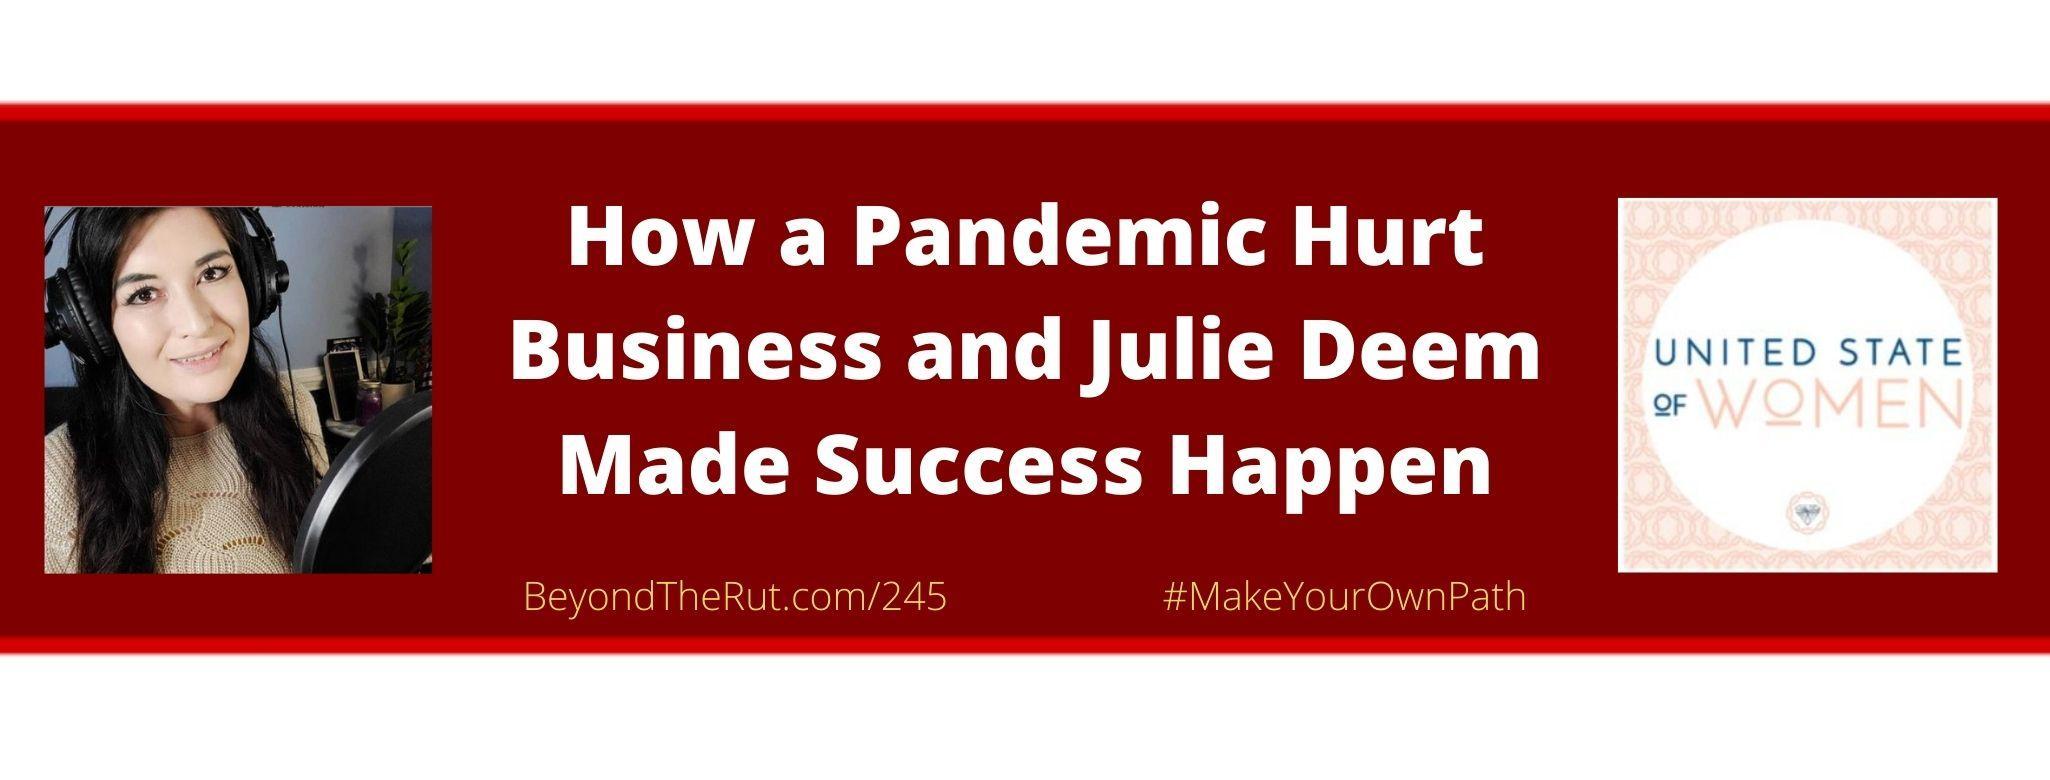 pandemic hurt business